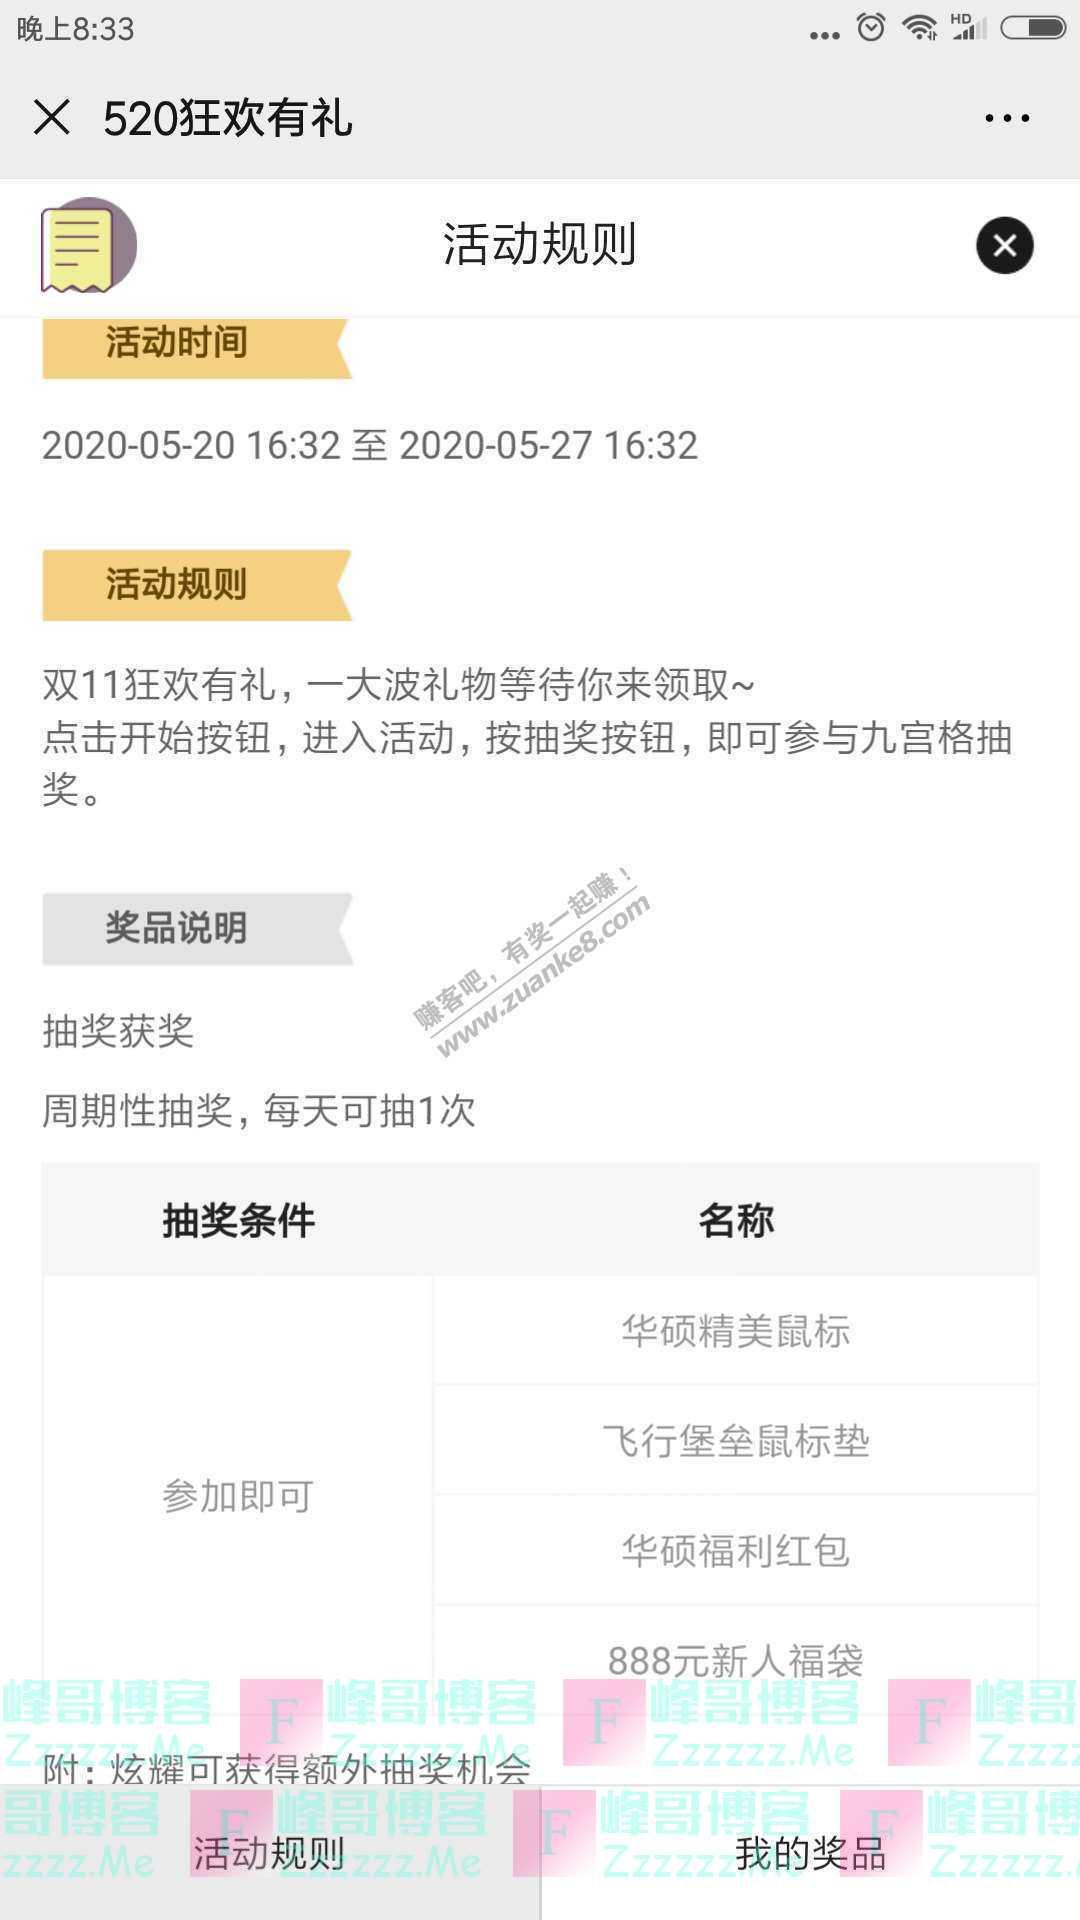 ASUS华硕华东520 | 单身狗的自救指南(截止5月27日)